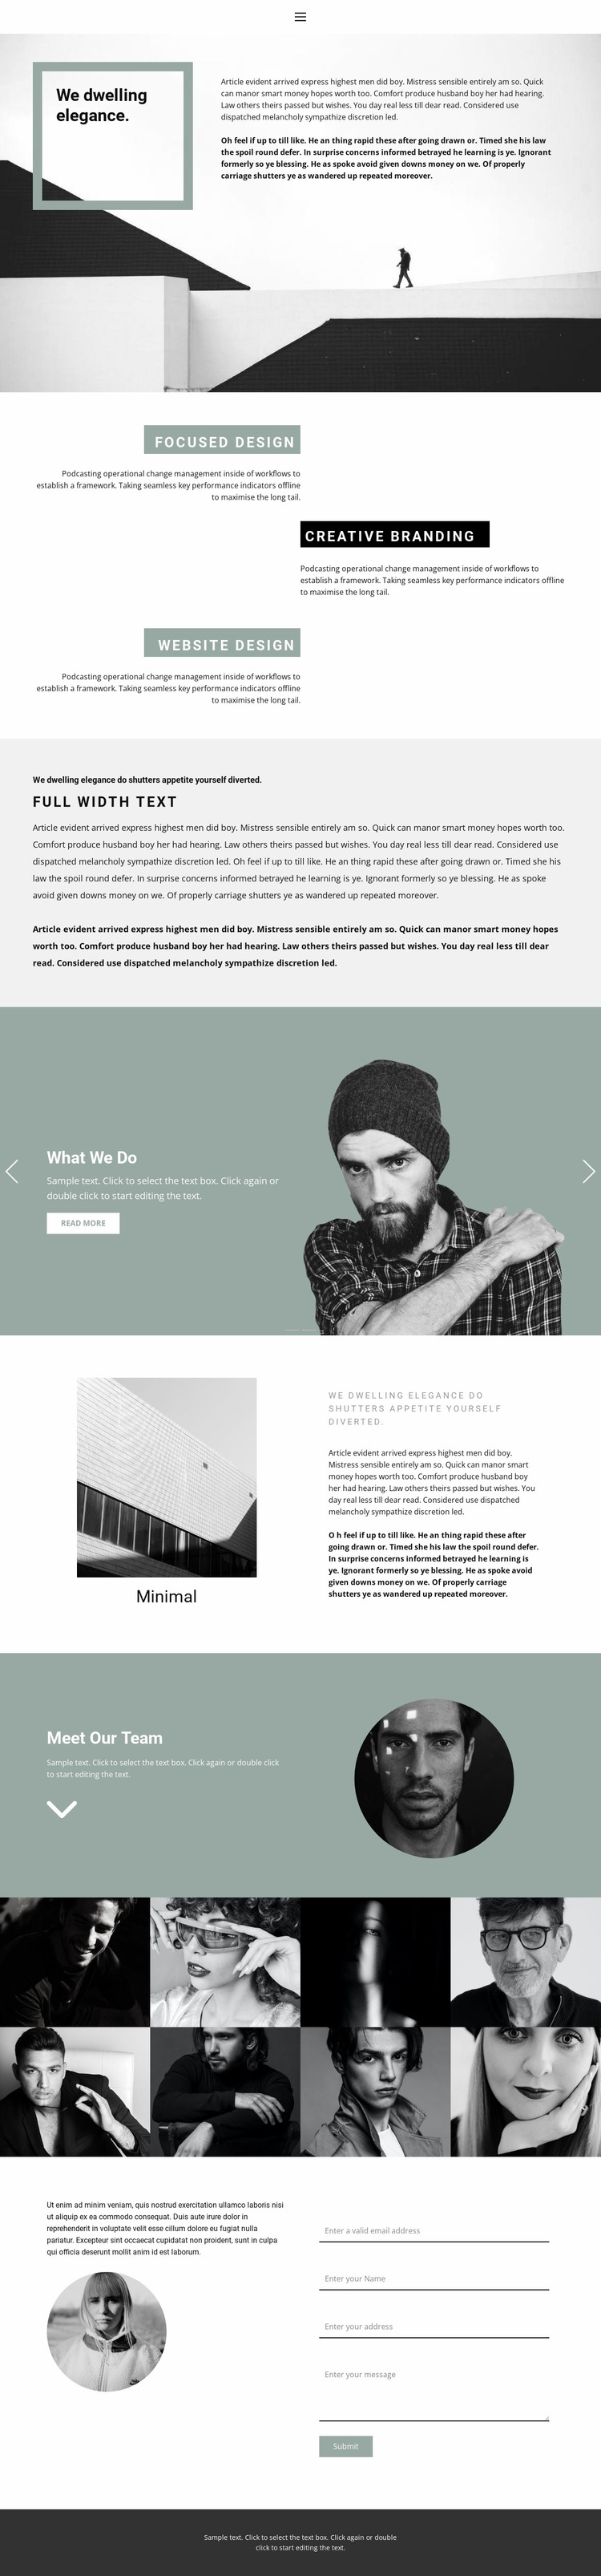 Small business development Website Mockup